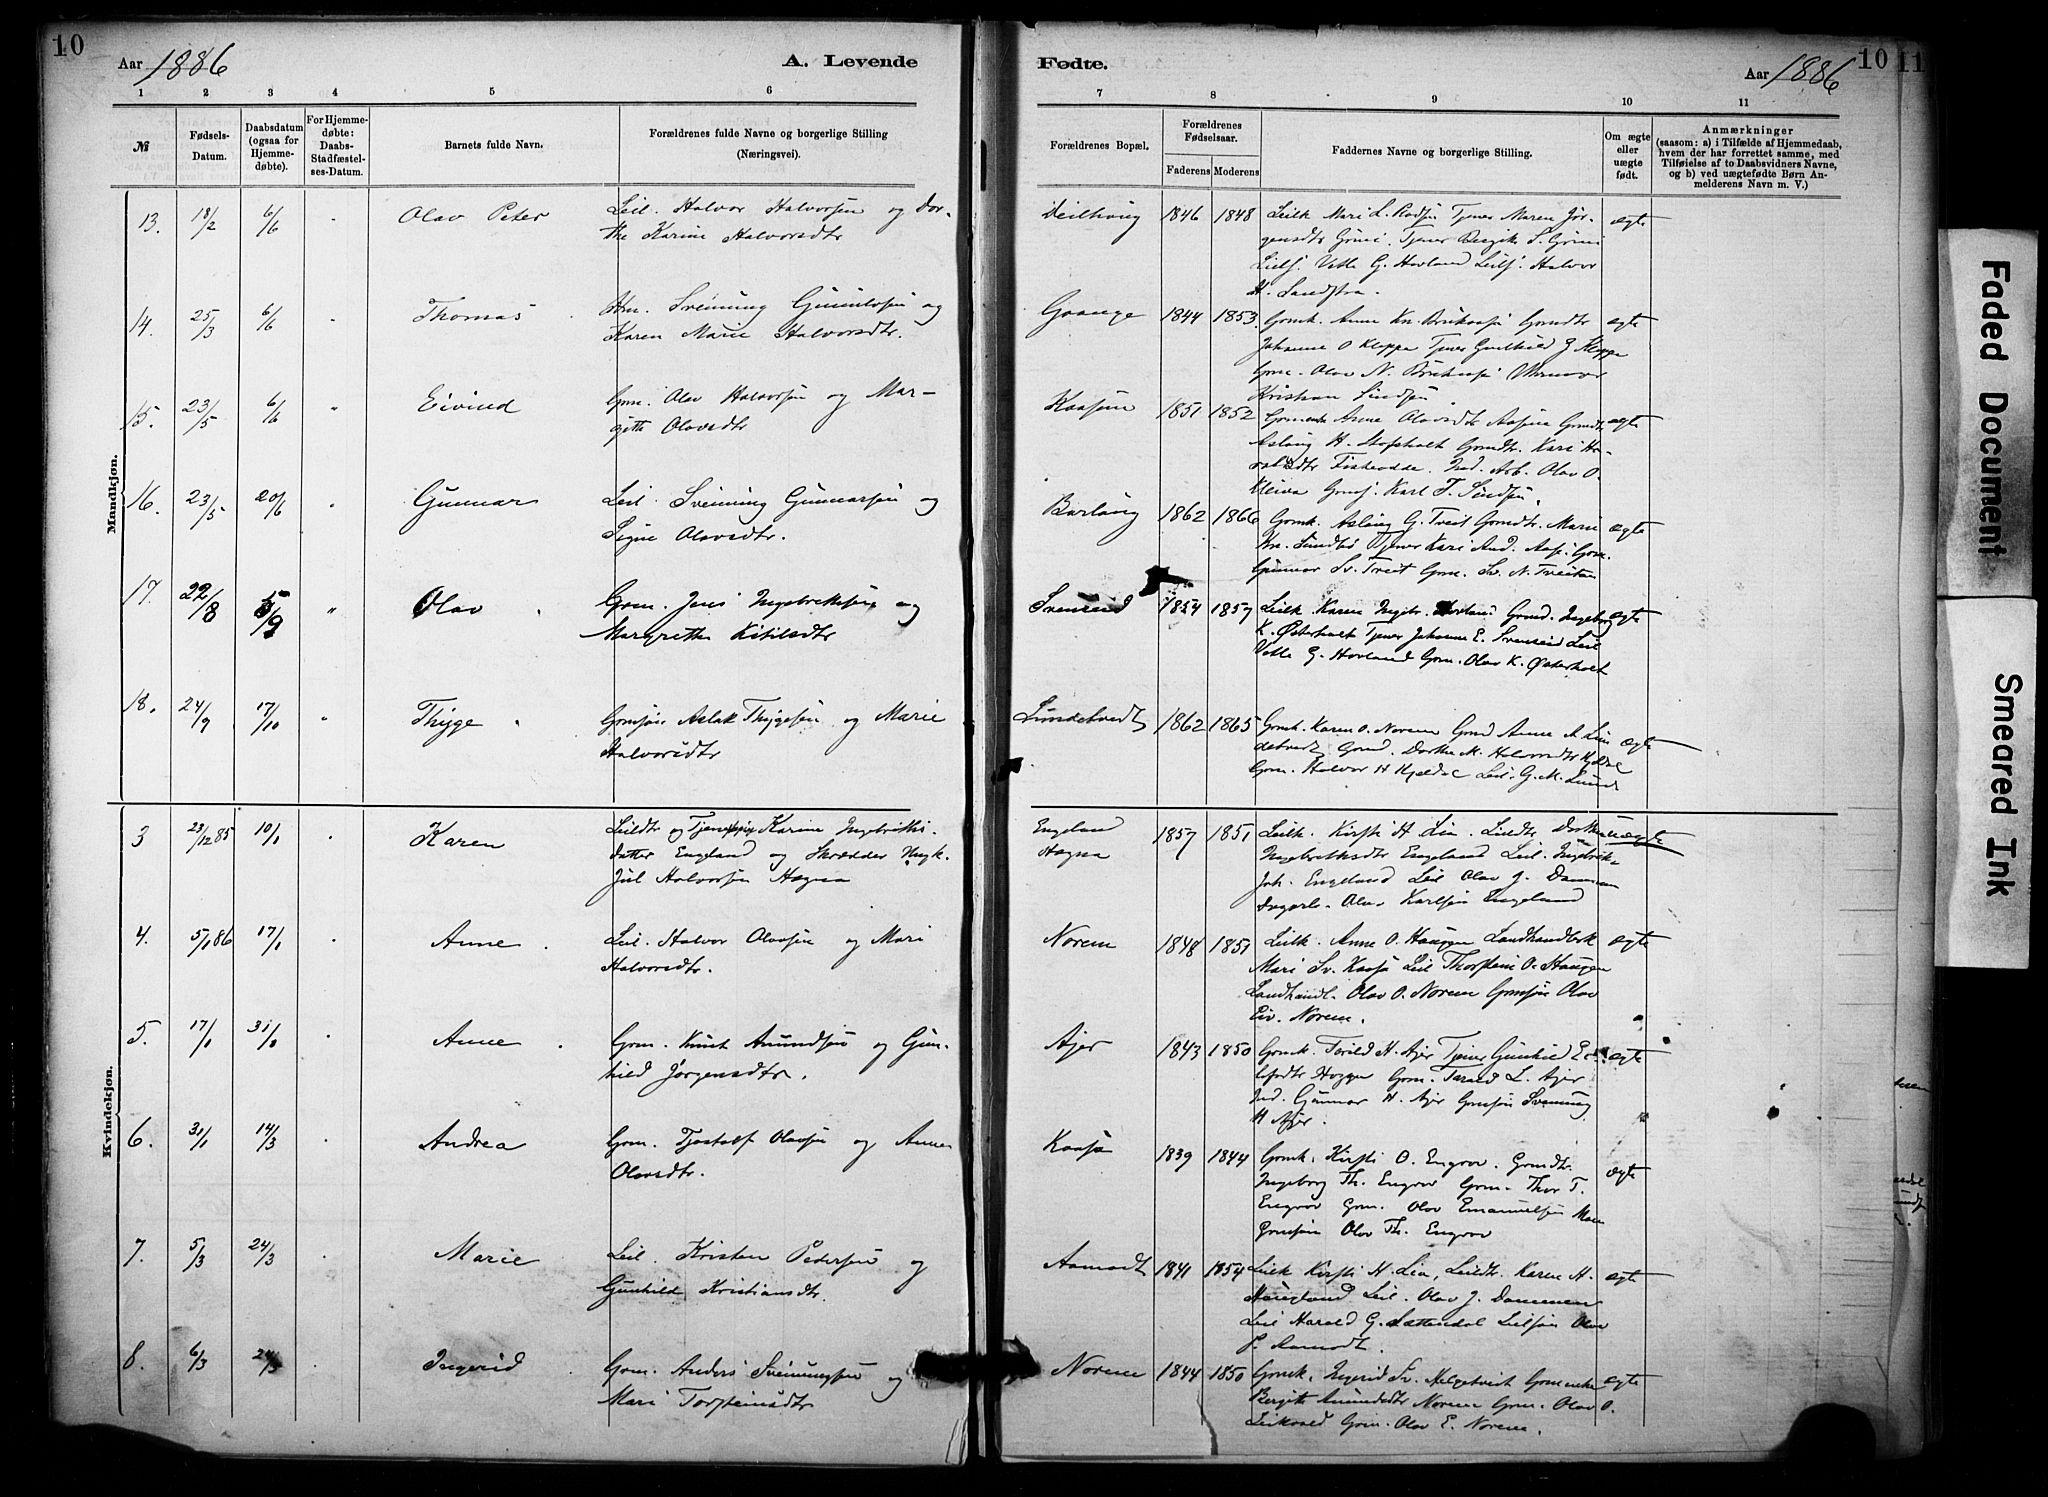 SAKO, Lunde kirkebøker, F/Fa/L0002: Ministerialbok nr. I 2, 1884-1892, s. 10